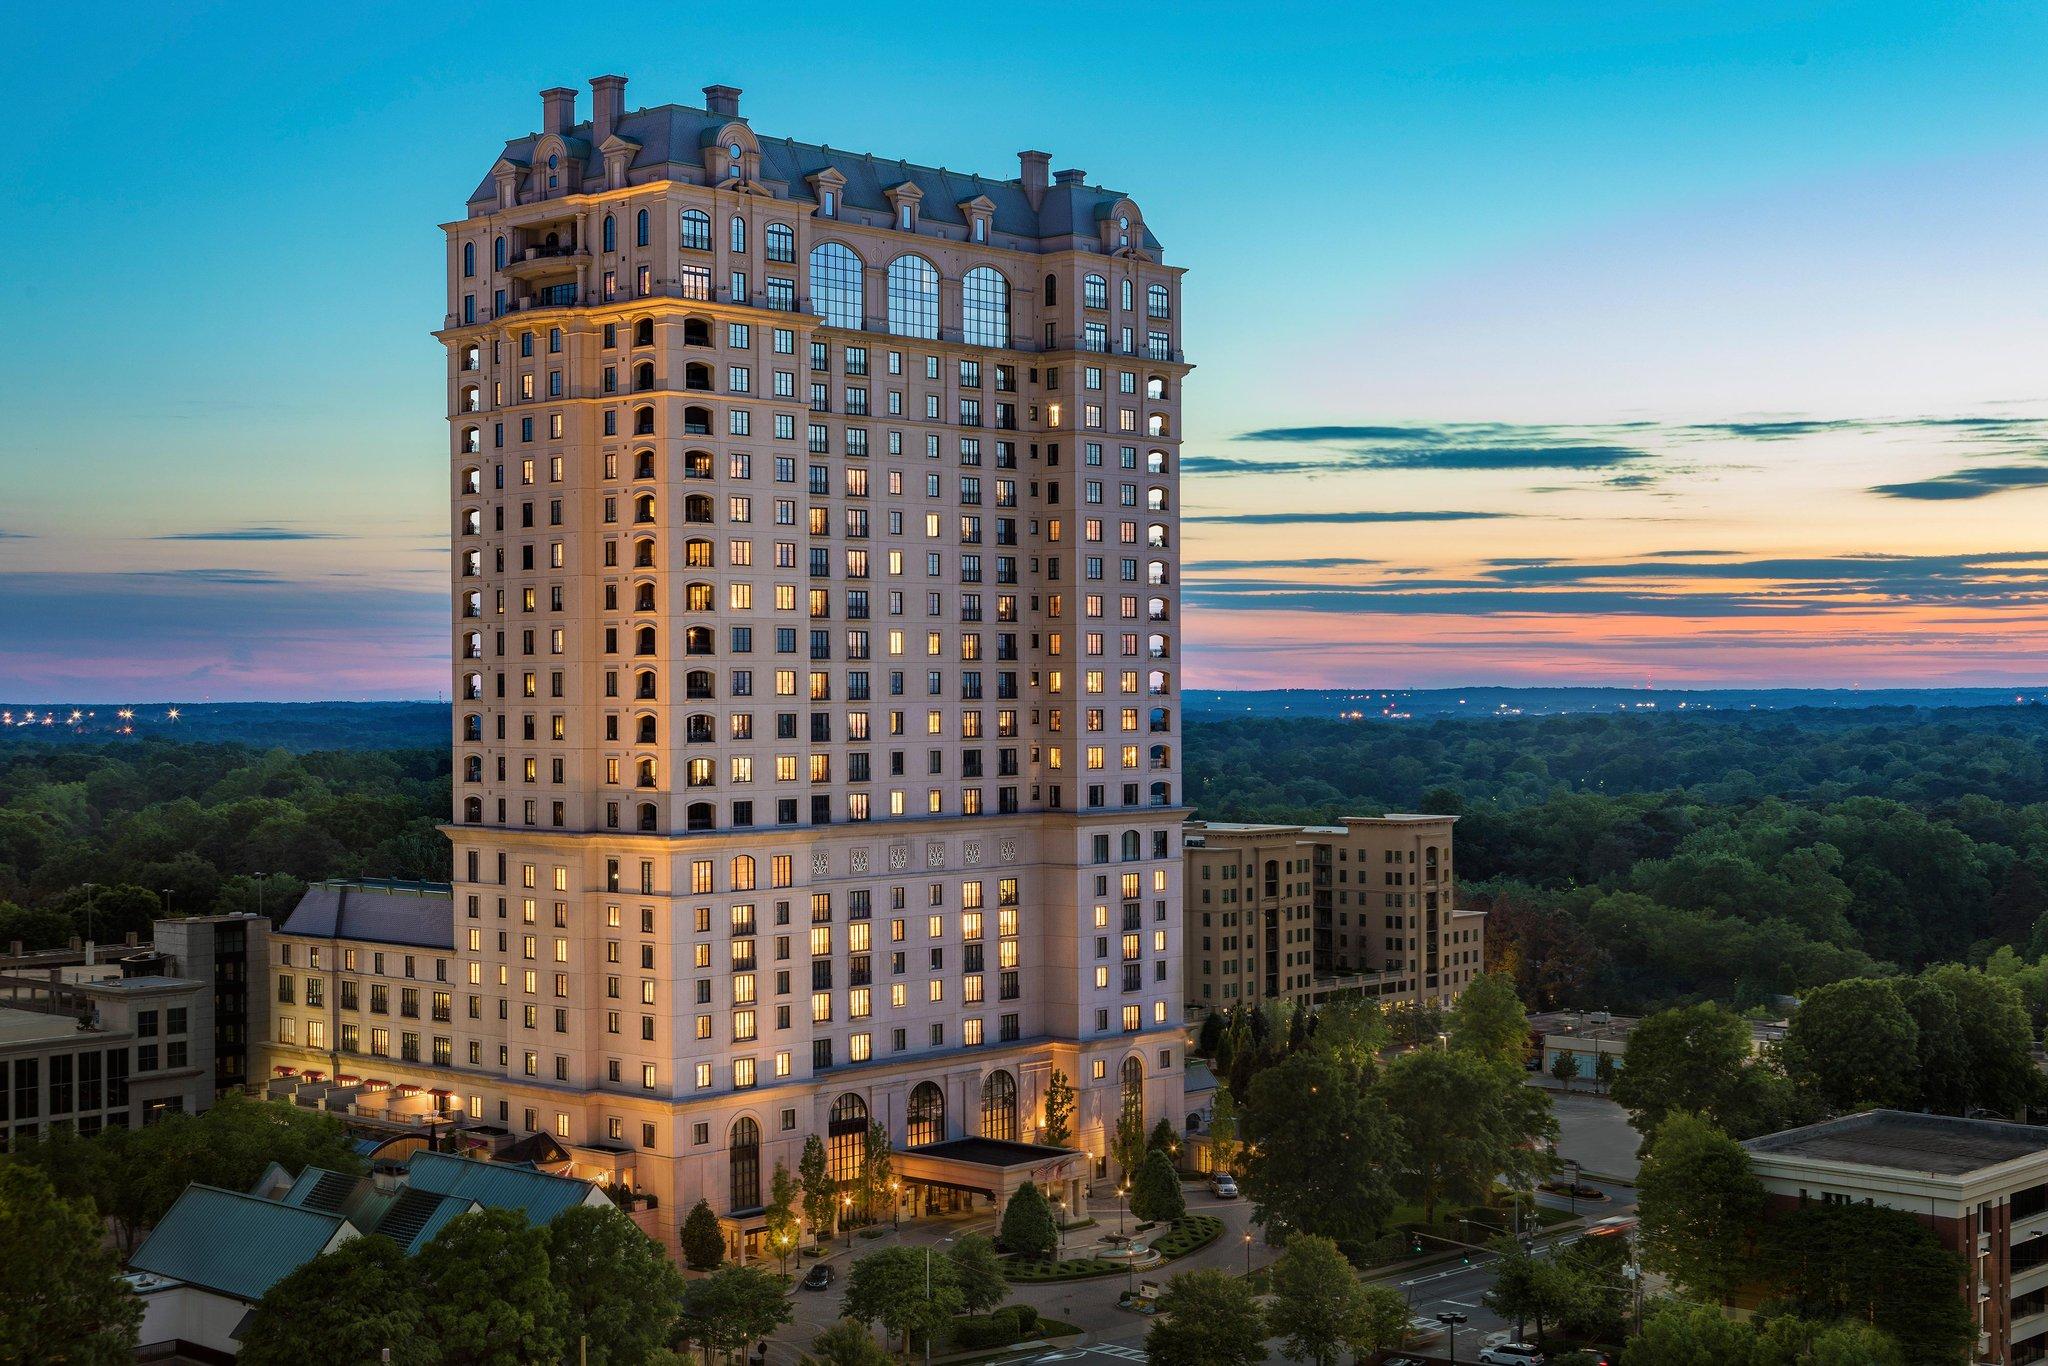 St. Regis luxury high-rise hotel in Buckhead neighborhood of Atlanta, GA